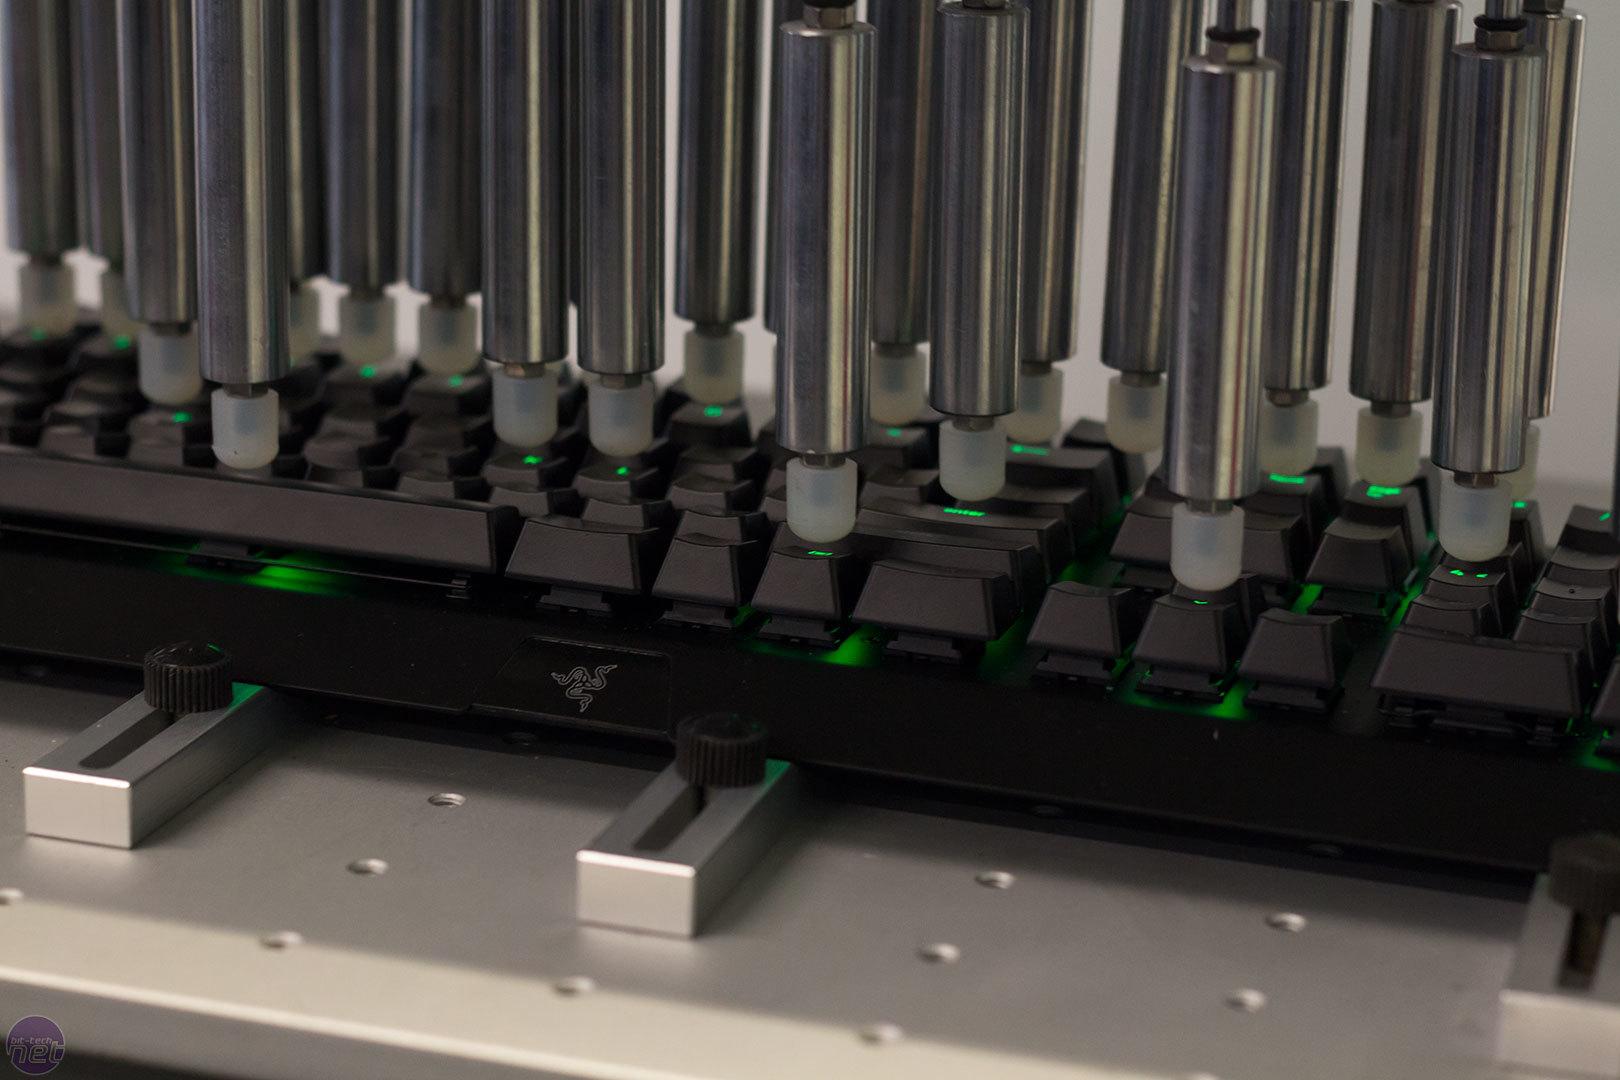 Razer reveals BlackWidow X, improved switches and Cherry MX models